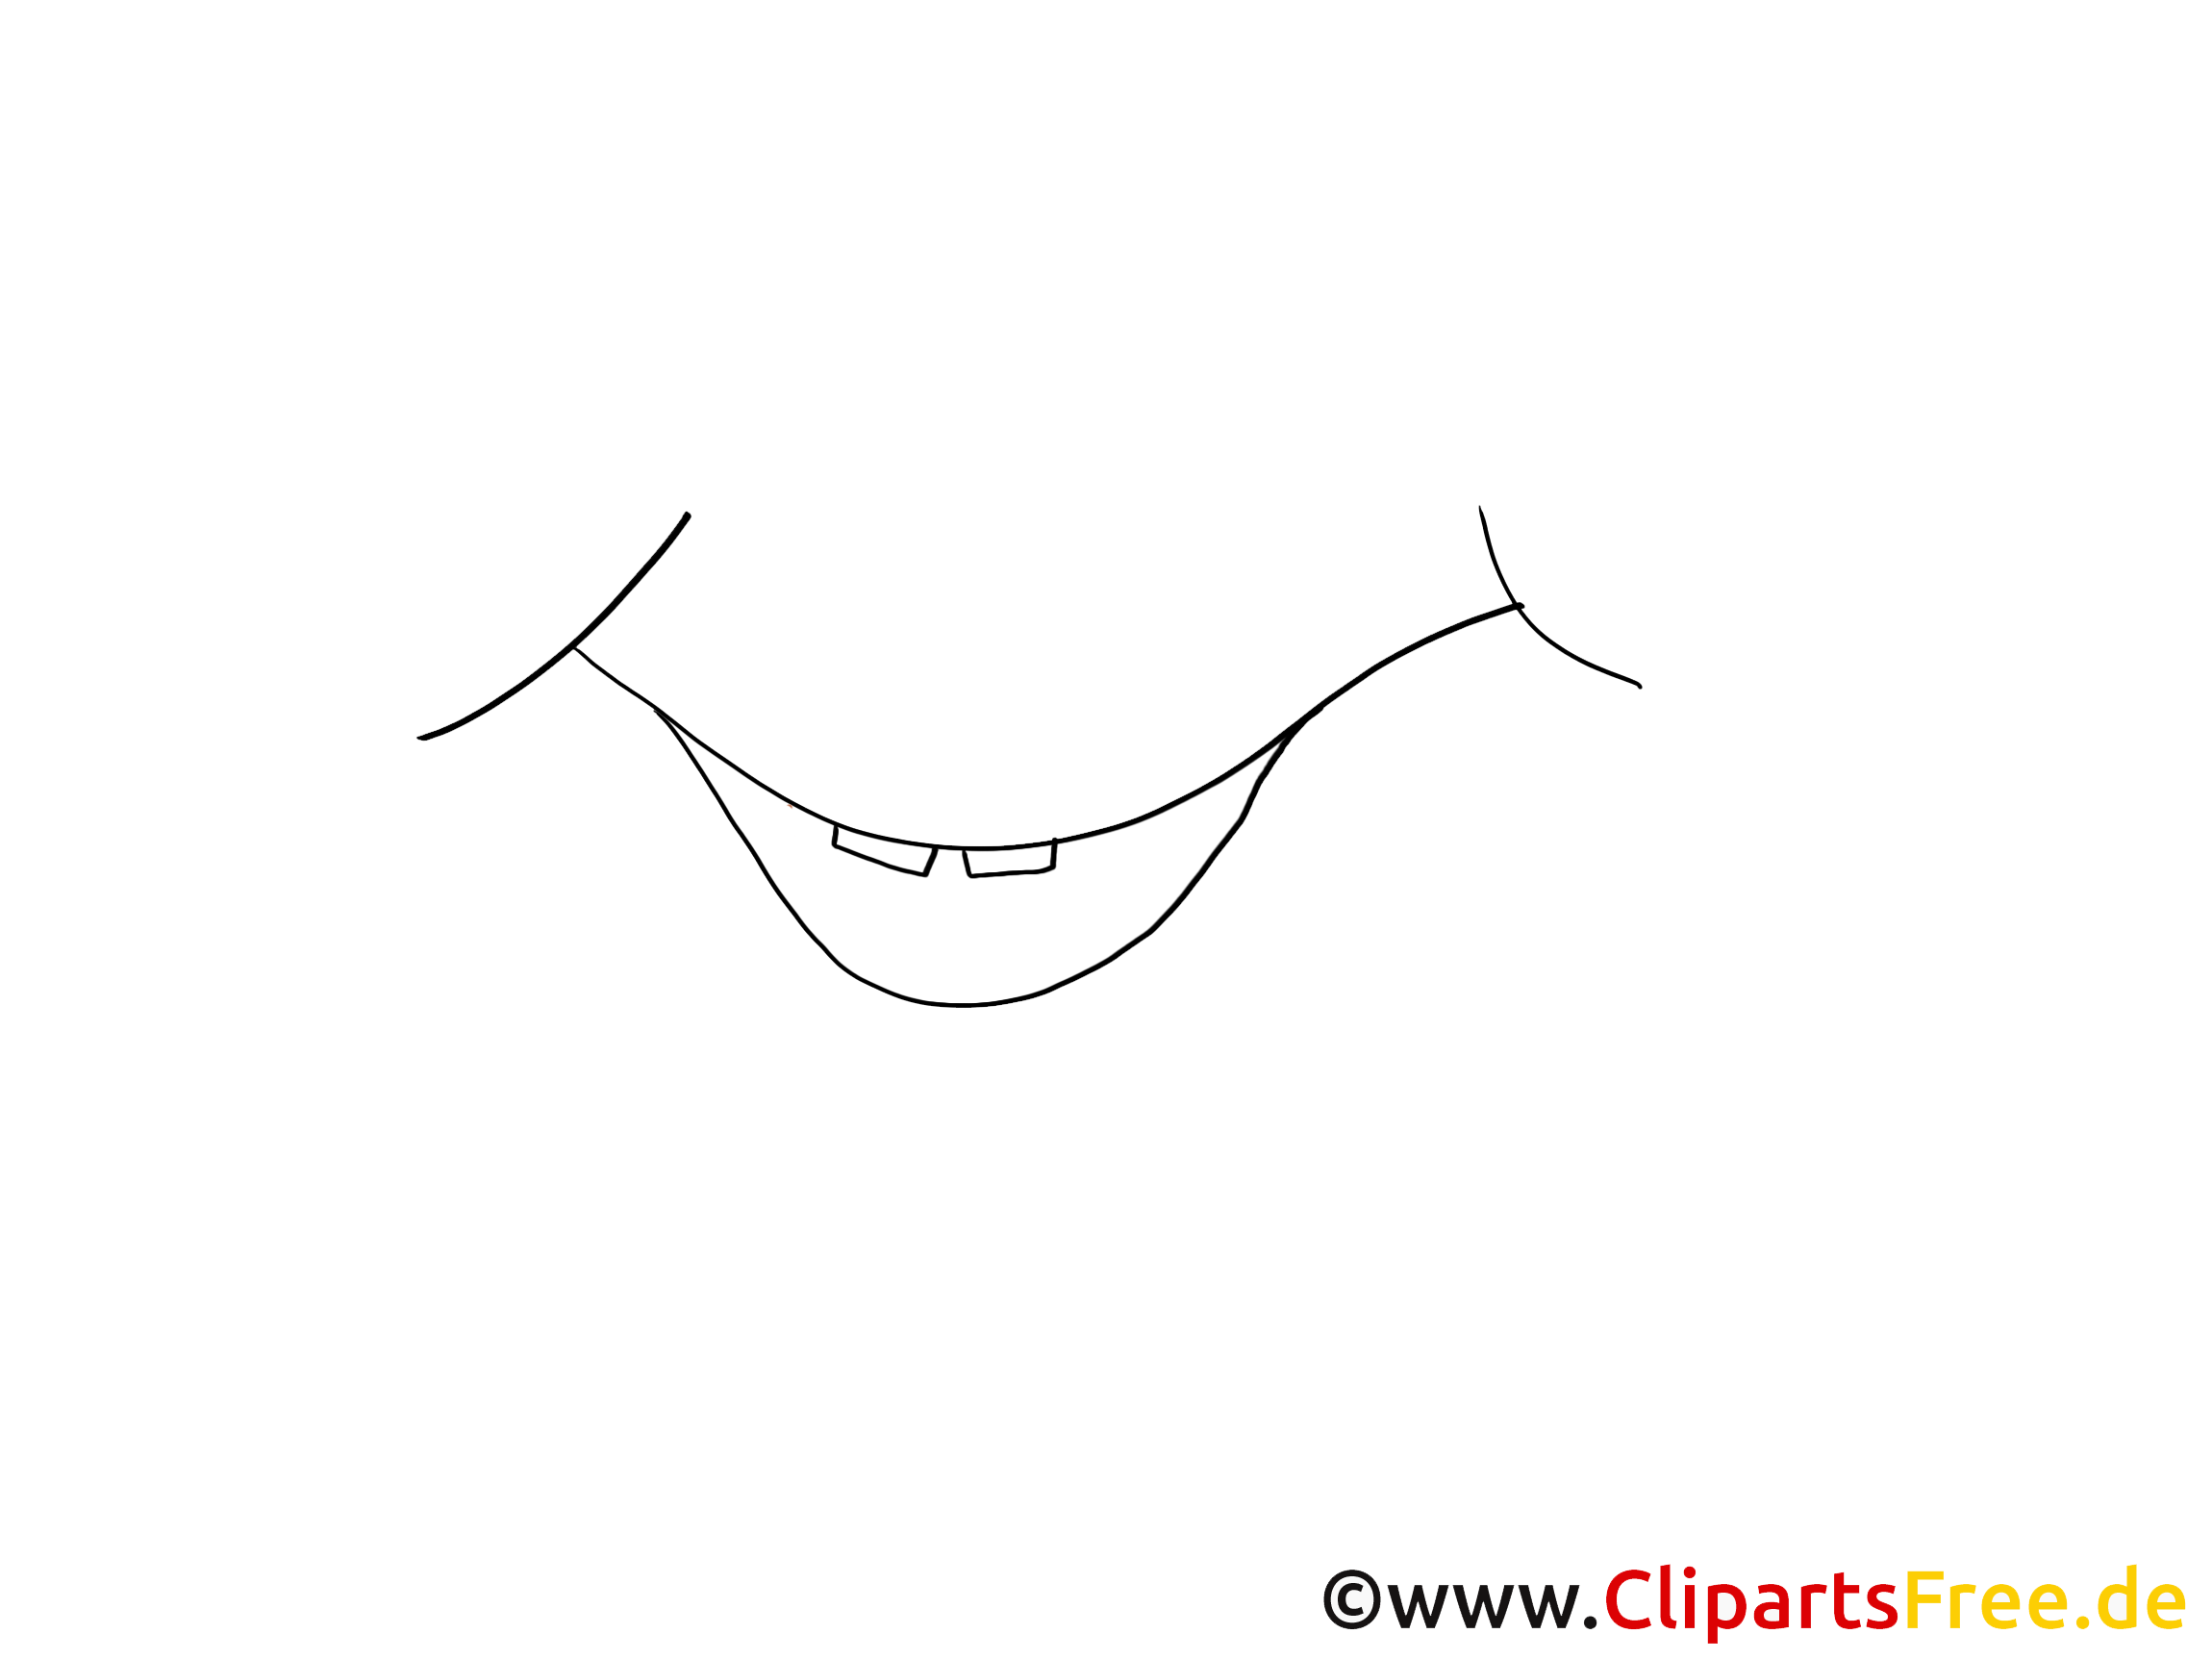 Sourire clip arts à imprimer – Dessin illustrations